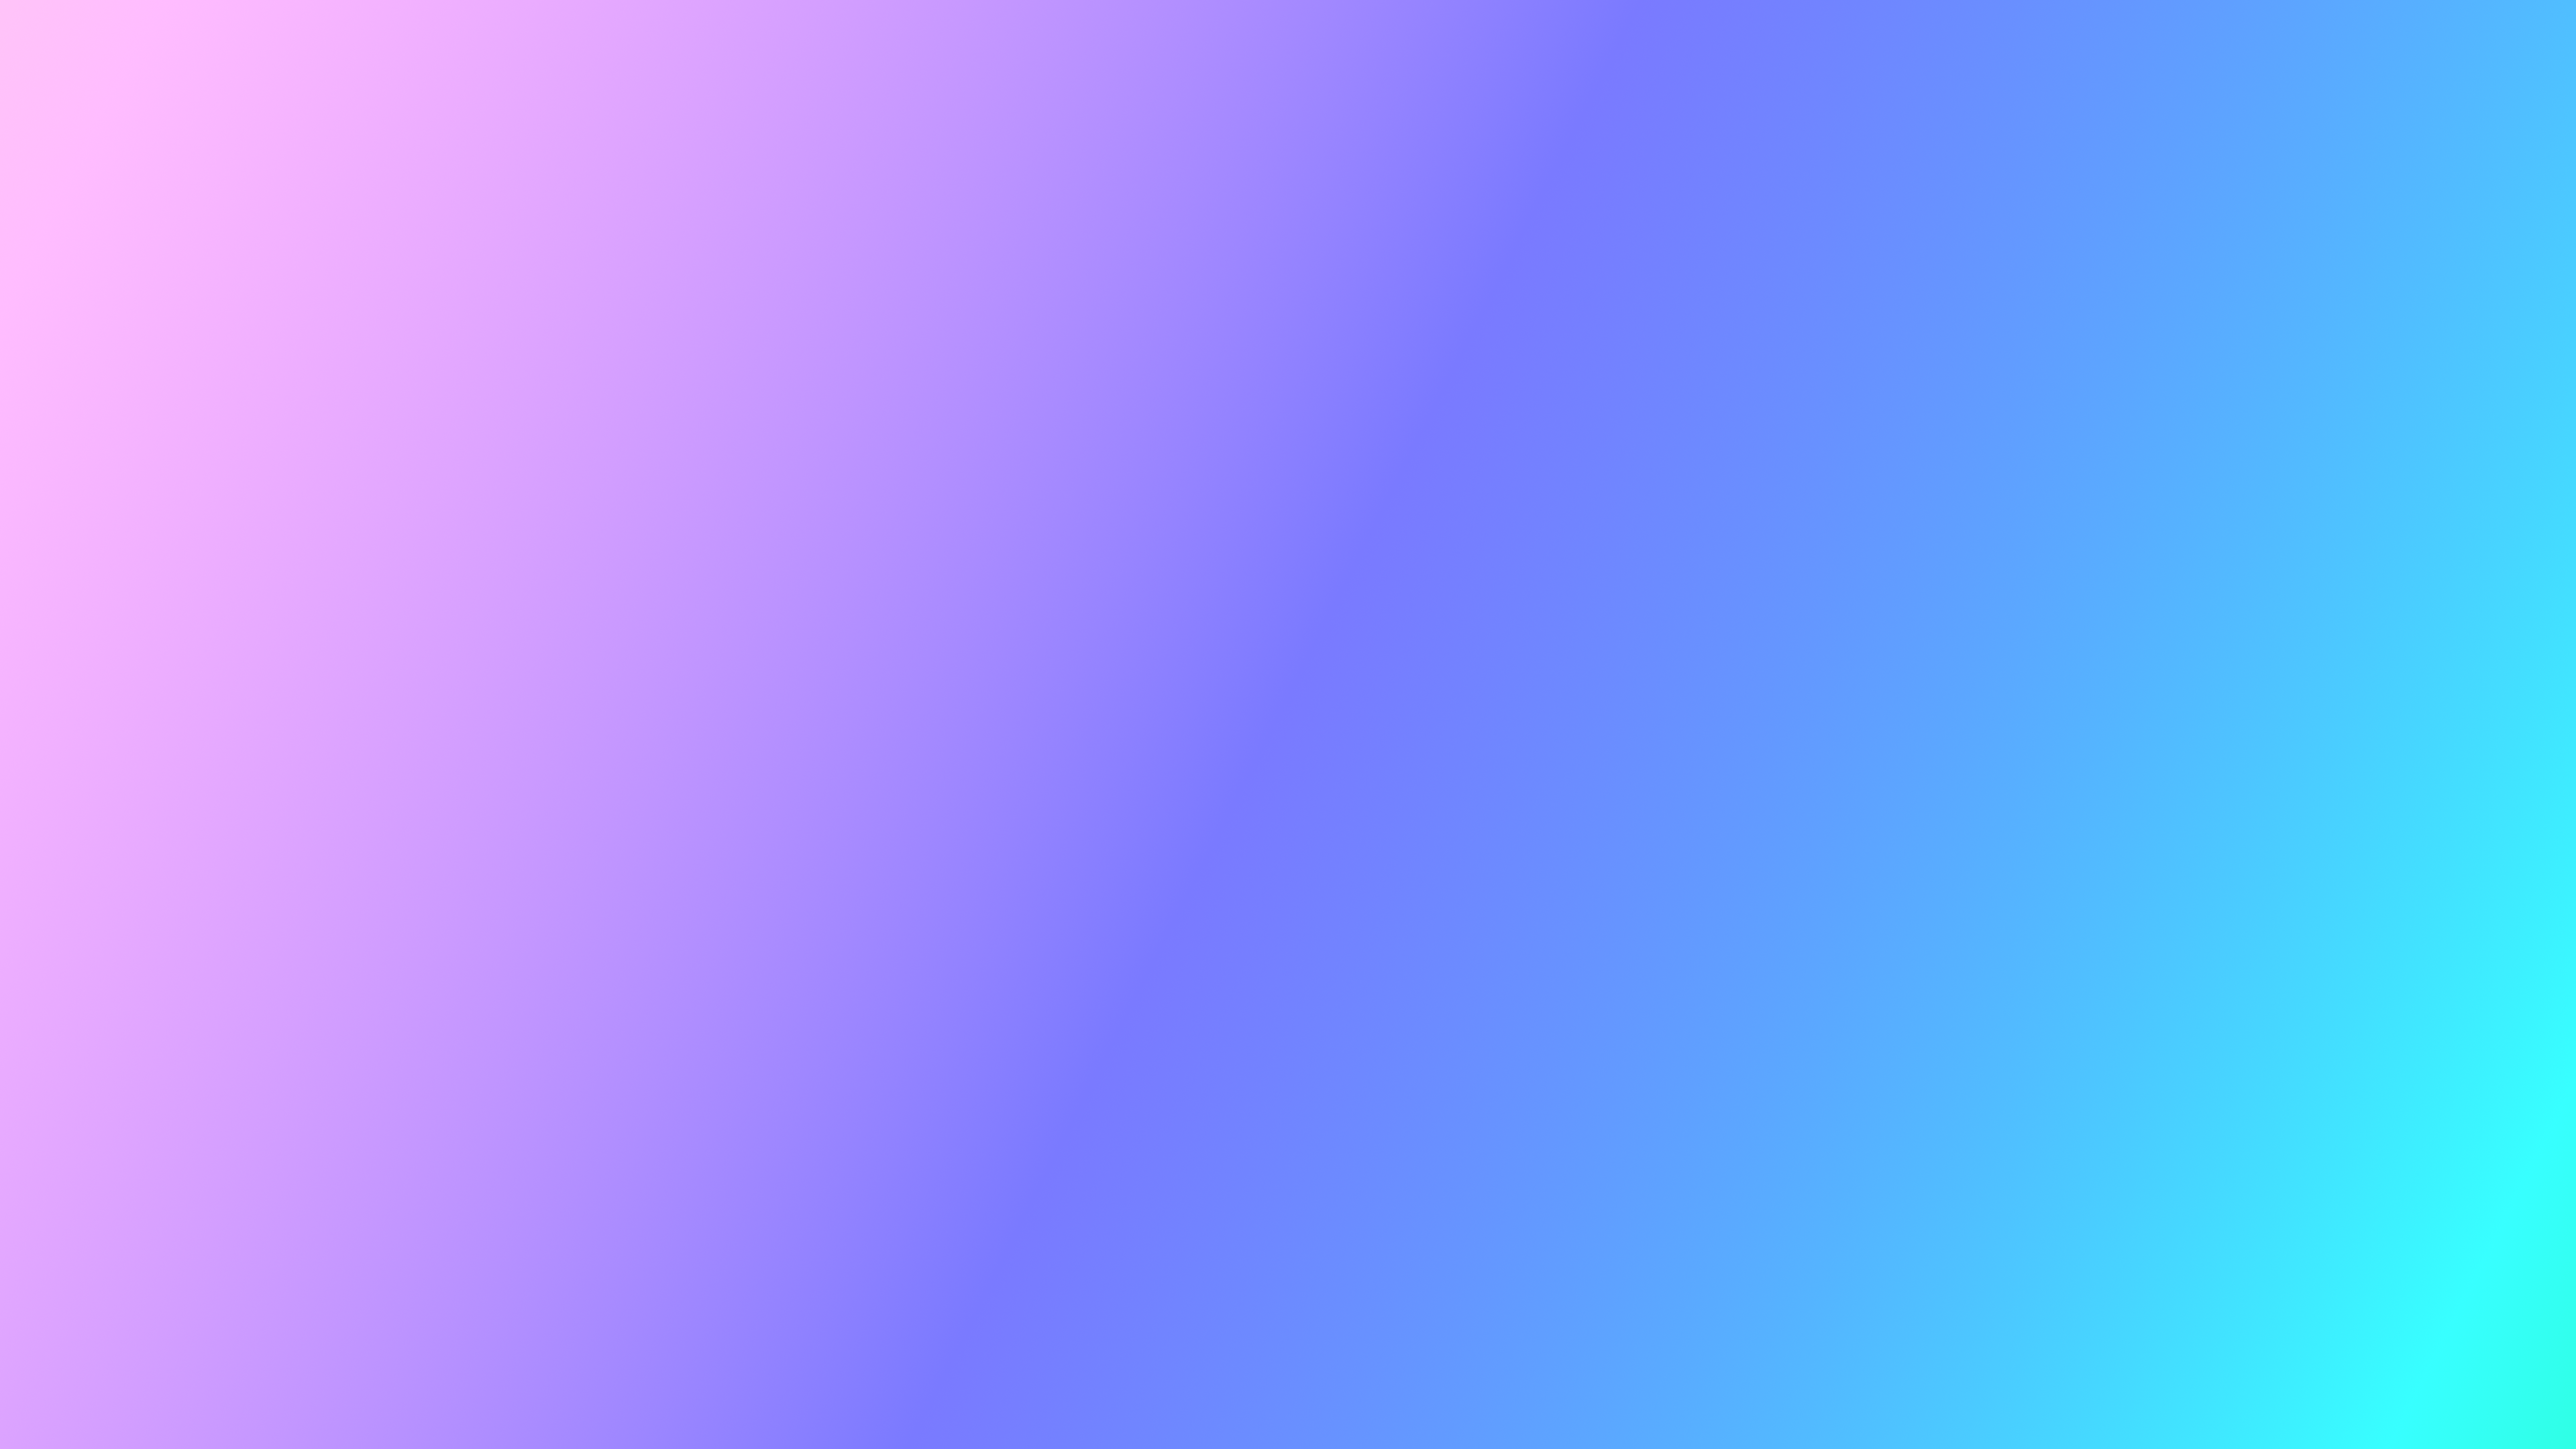 A Simplistic Desktop Laptop Background Resolution 4k 3840 X 2160 Px Ombre Wallpapers Grey Wallpaper Iphone Light Purple Wallpaper